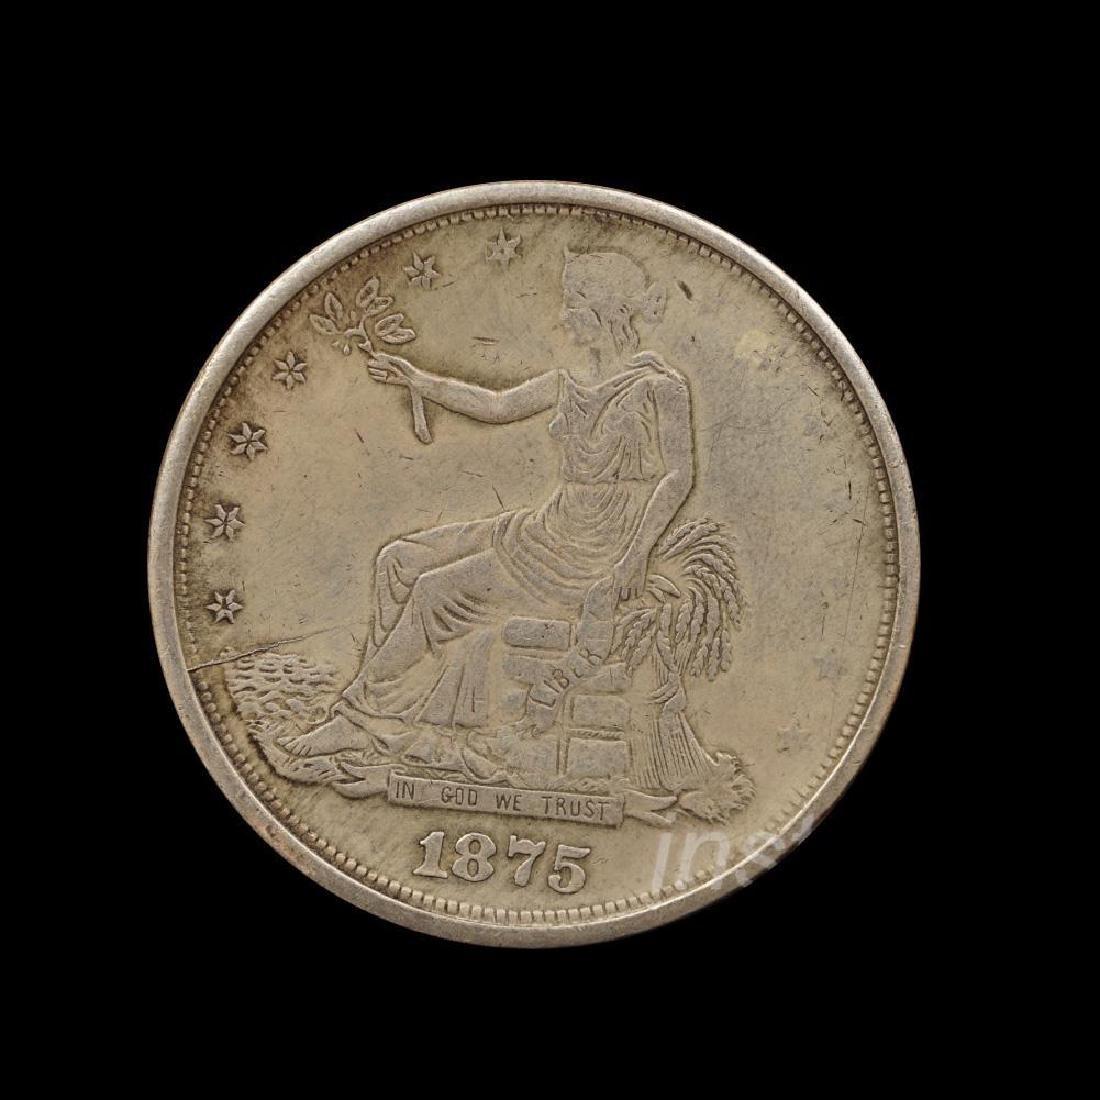 1875 United States Trade Dollar Commemorative Coin - 8